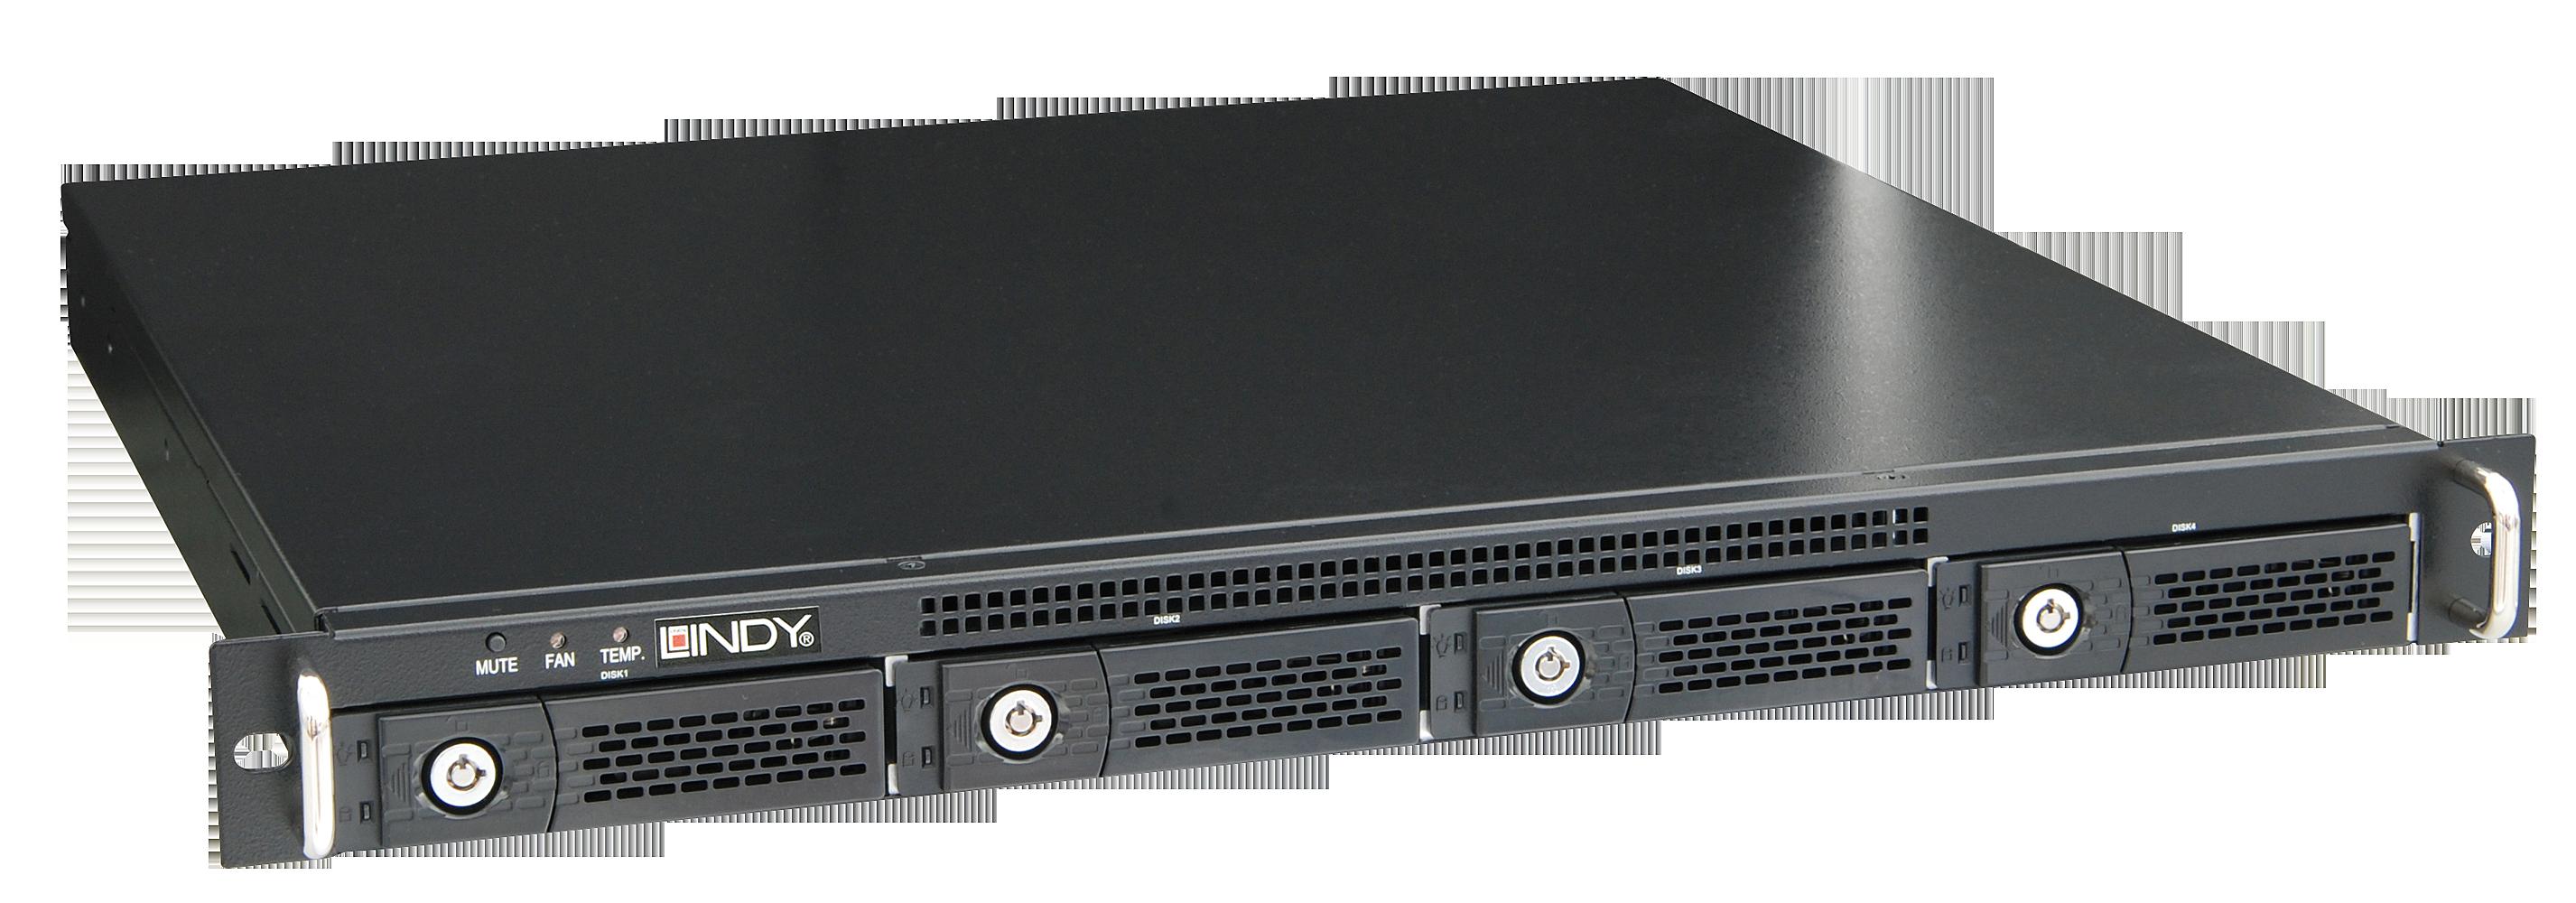 SAS/SATA RAID Storage System 19 1HE 4 Bay Festplattenarray